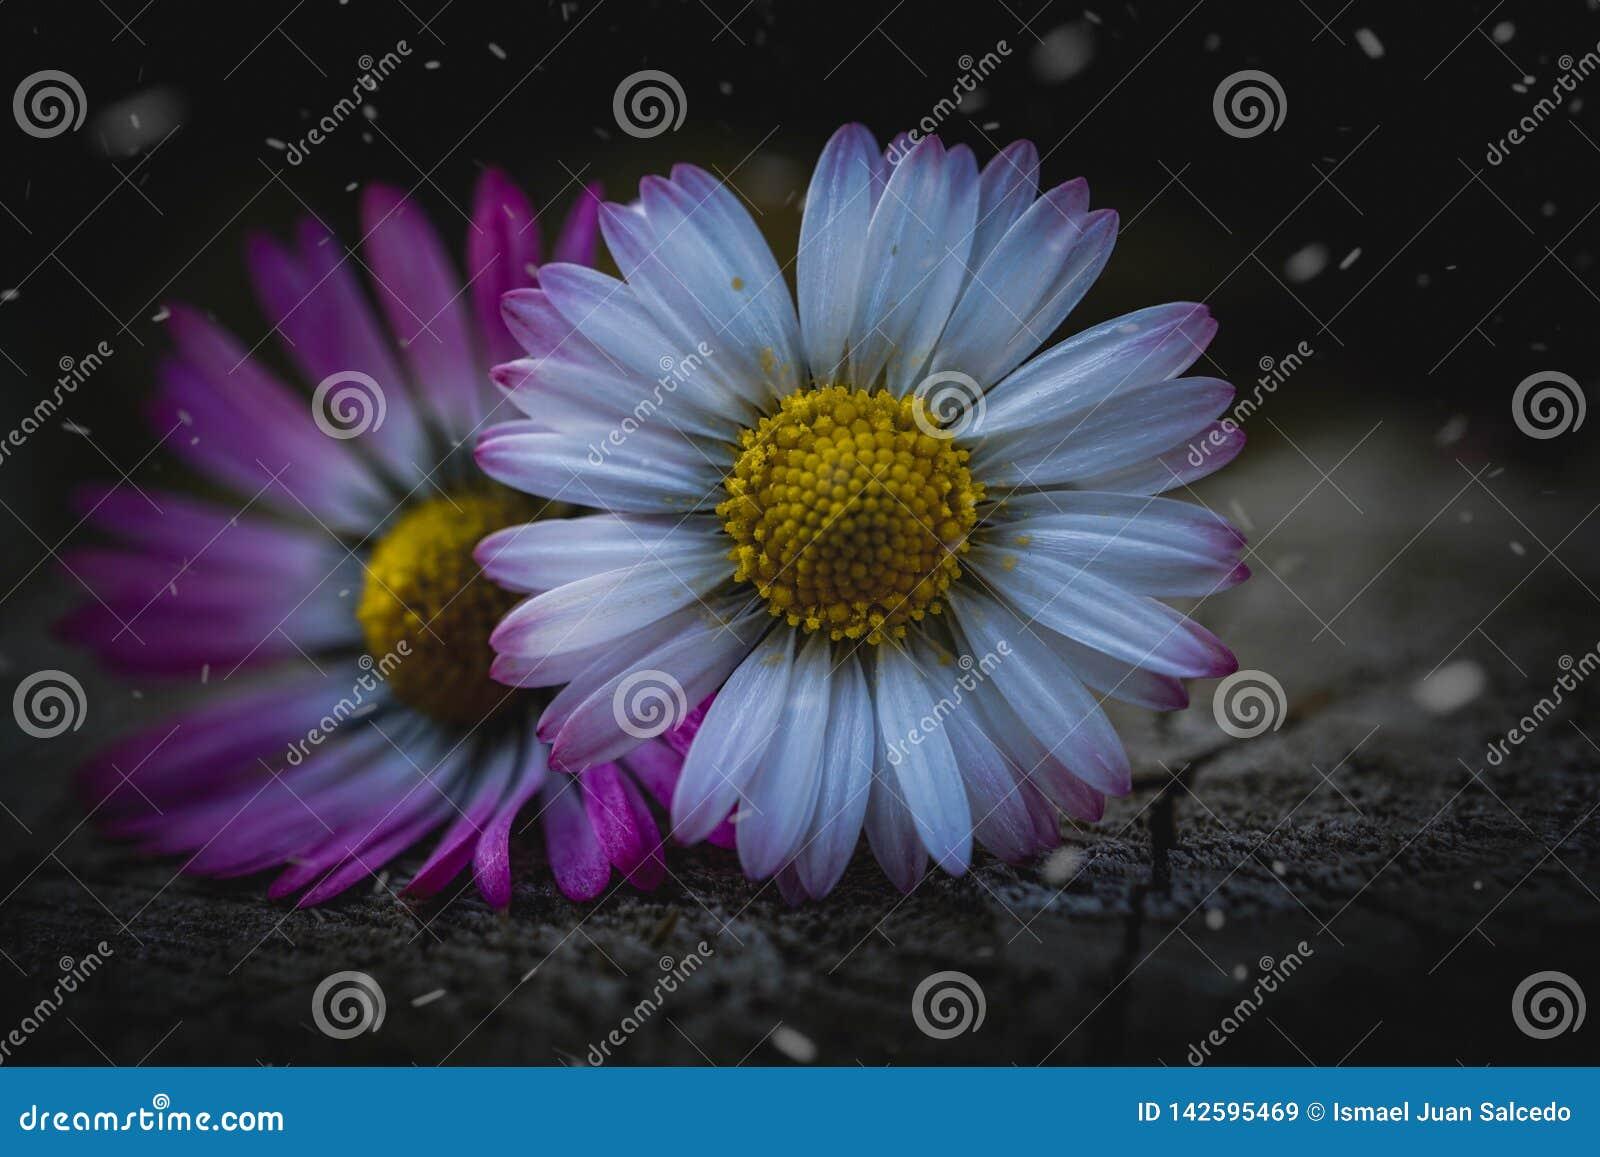 Daisy flower plant petals in springtime